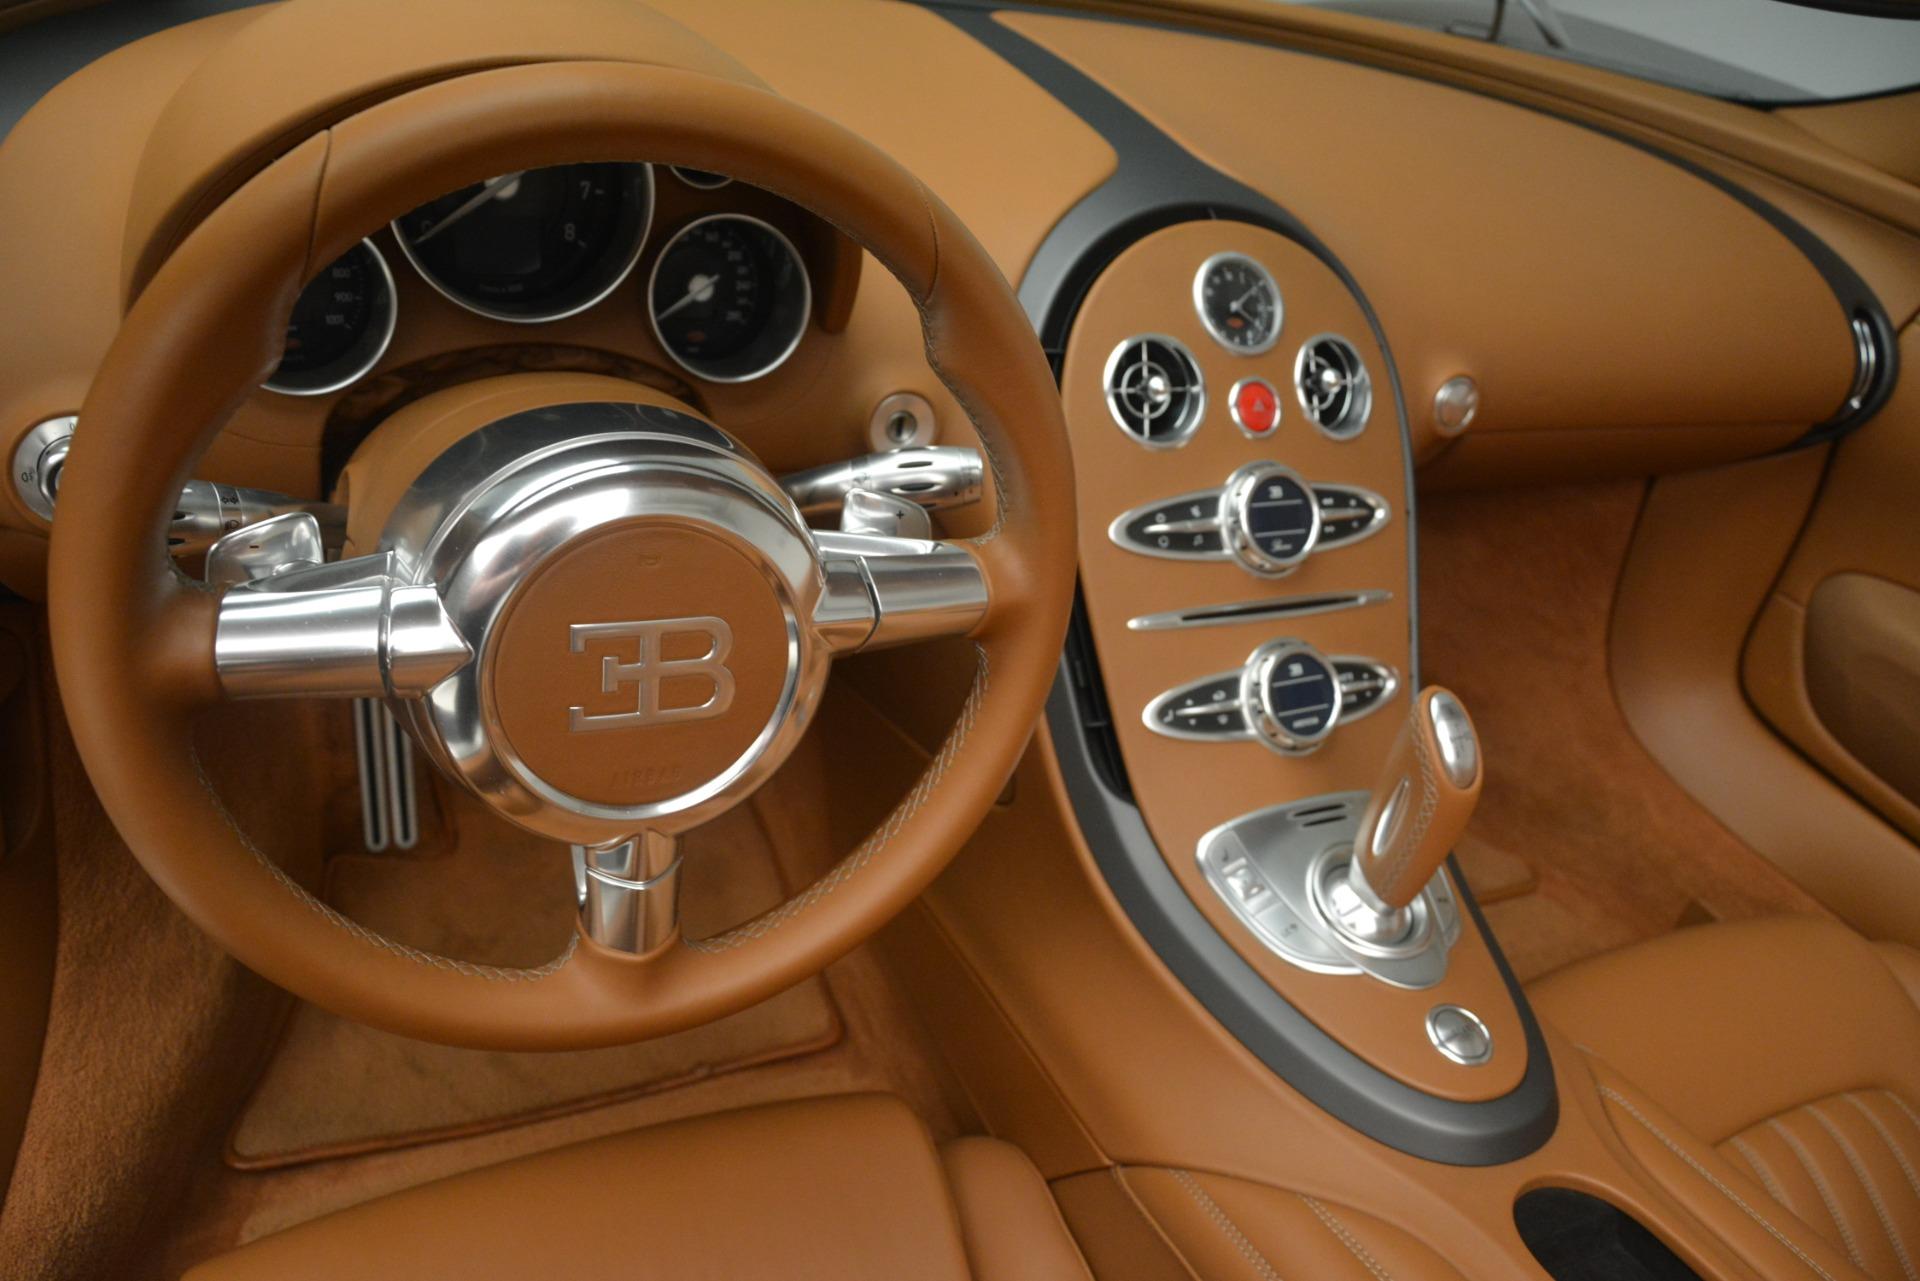 Used 2010 Bugatti Veyron 16.4 Grand Sport For Sale In Greenwich, CT 3159_p28